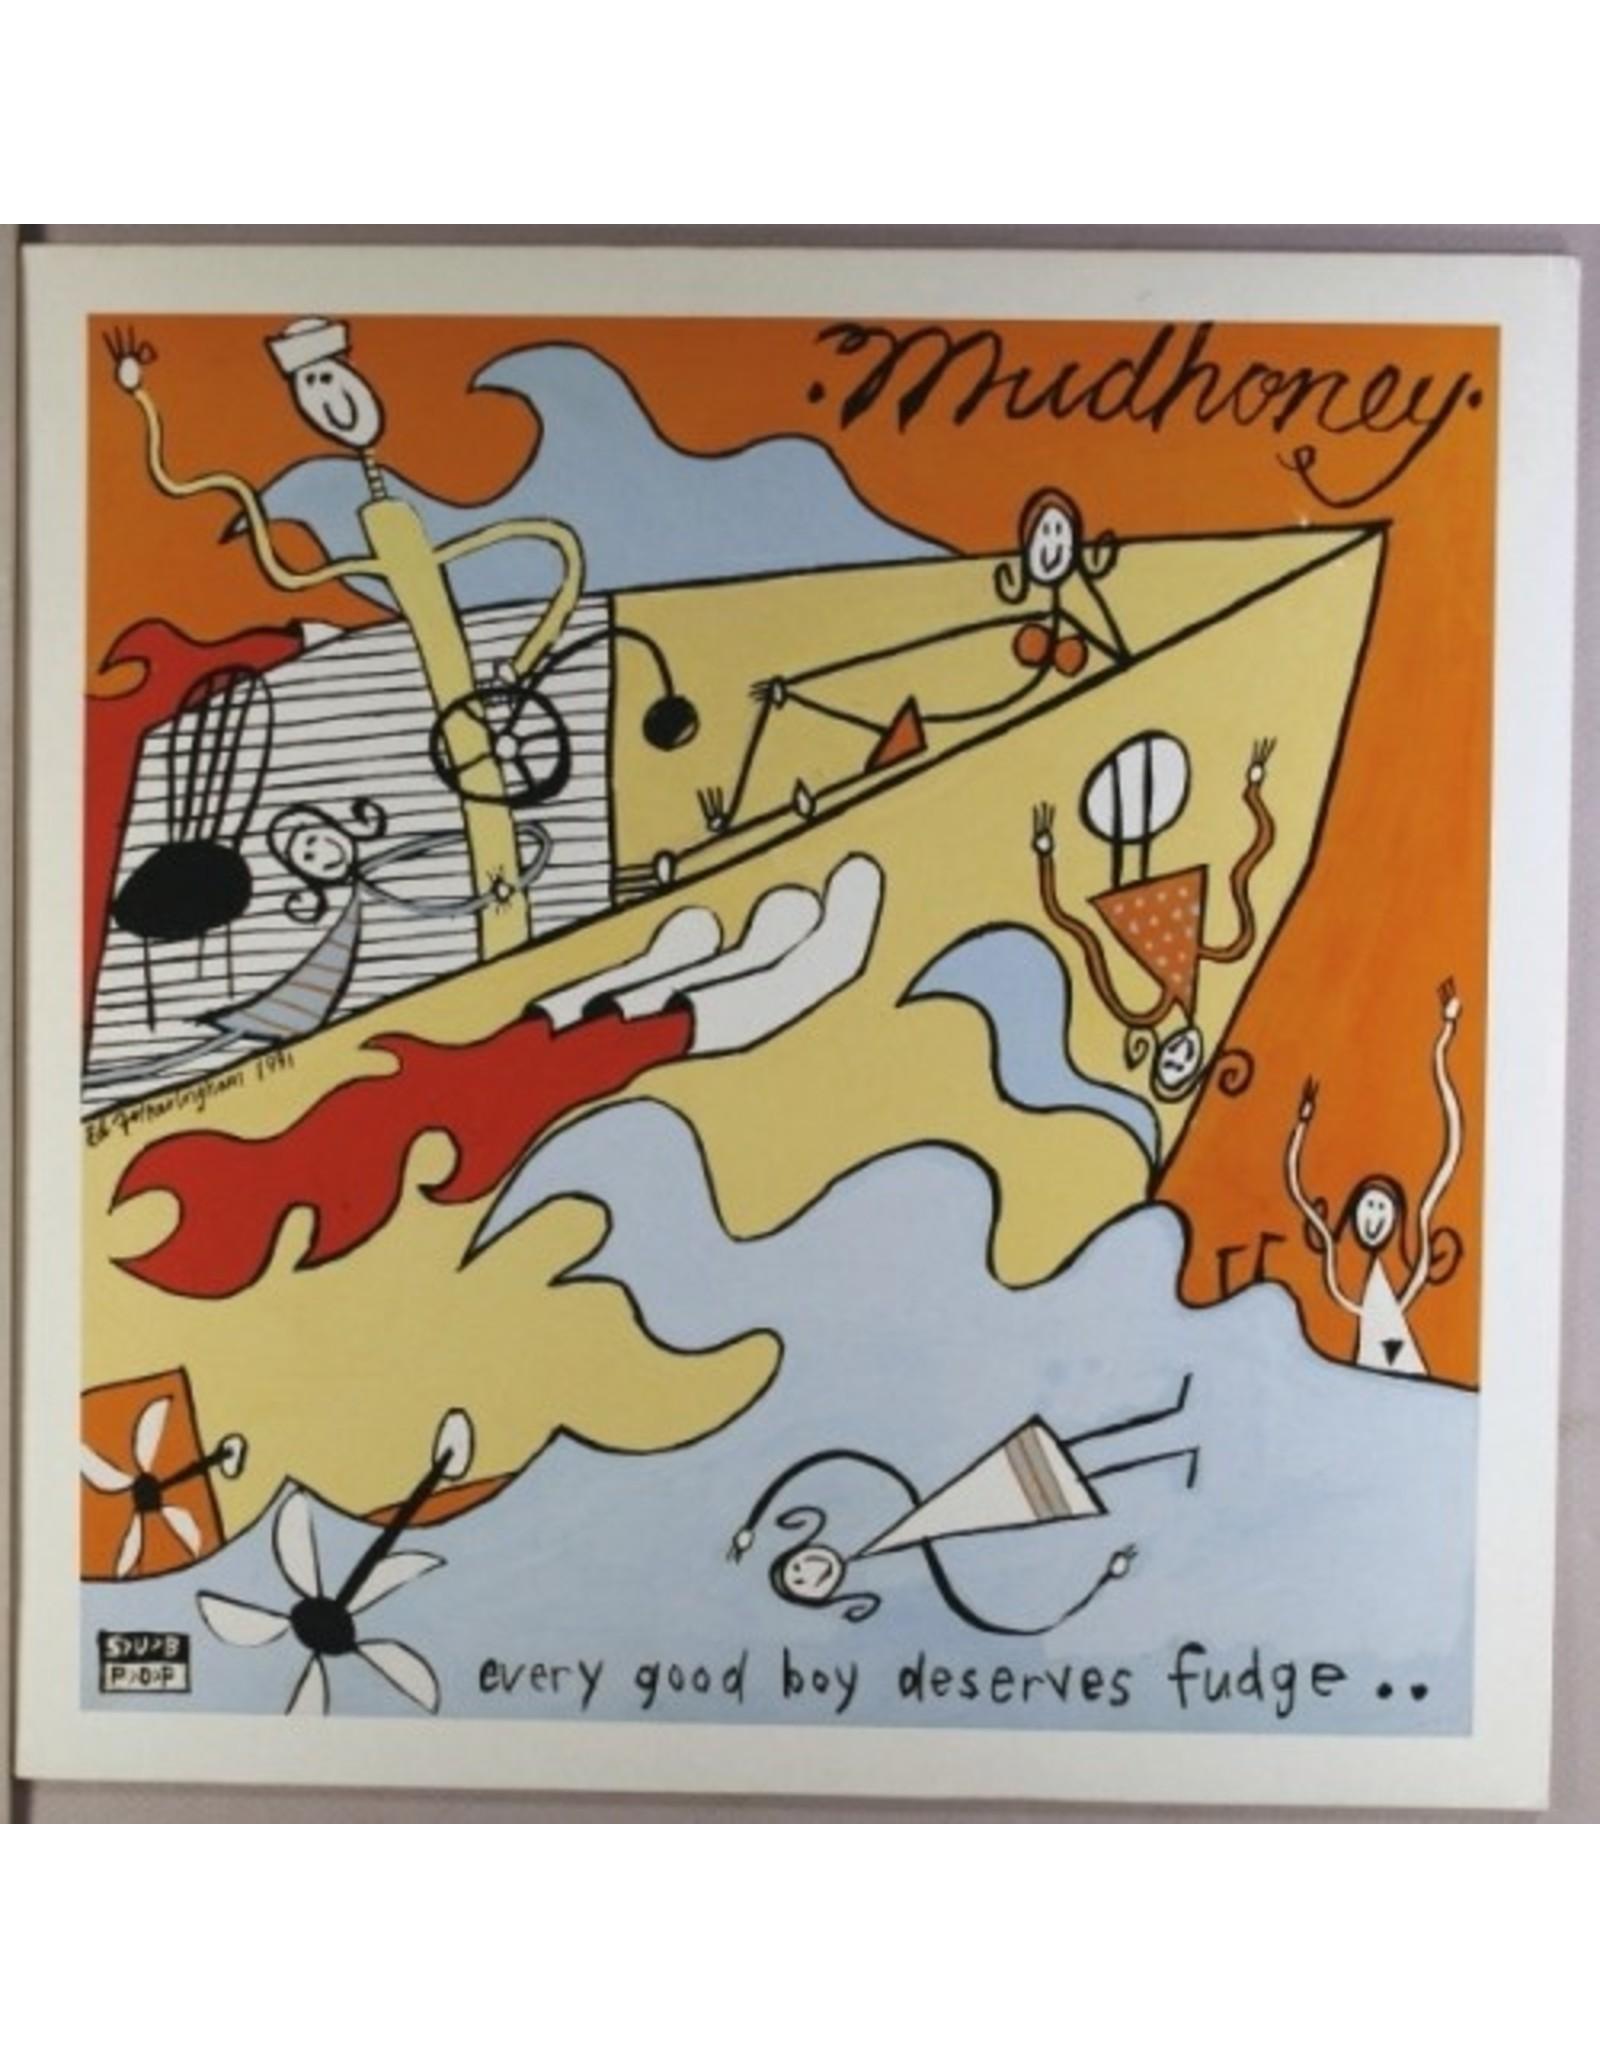 New Vinyl Mudhoney - Every Good Boy... LP